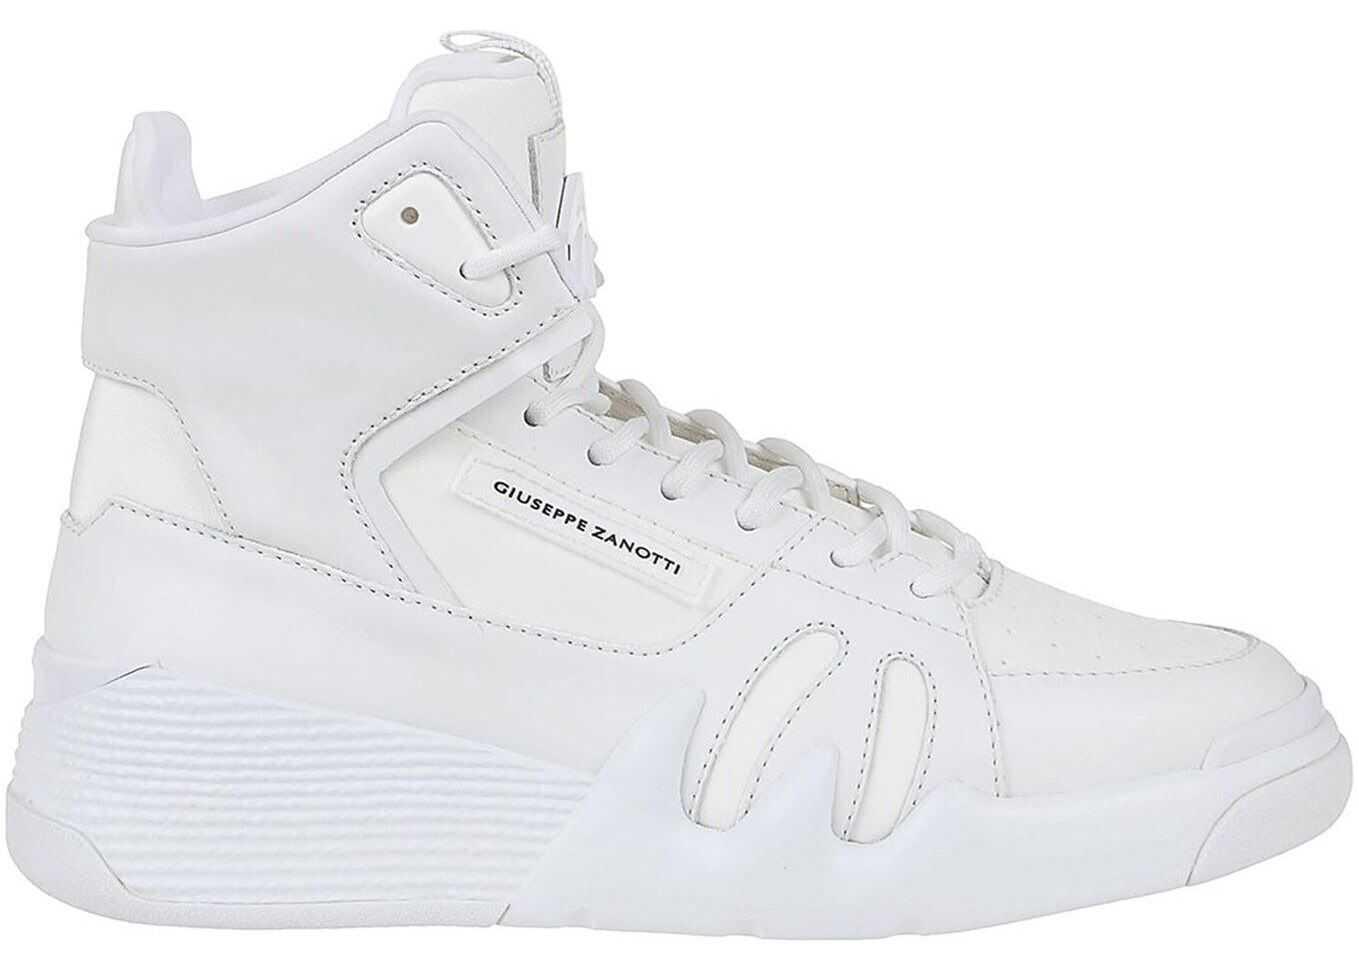 Giuseppe Zanotti Talon Sneakers White